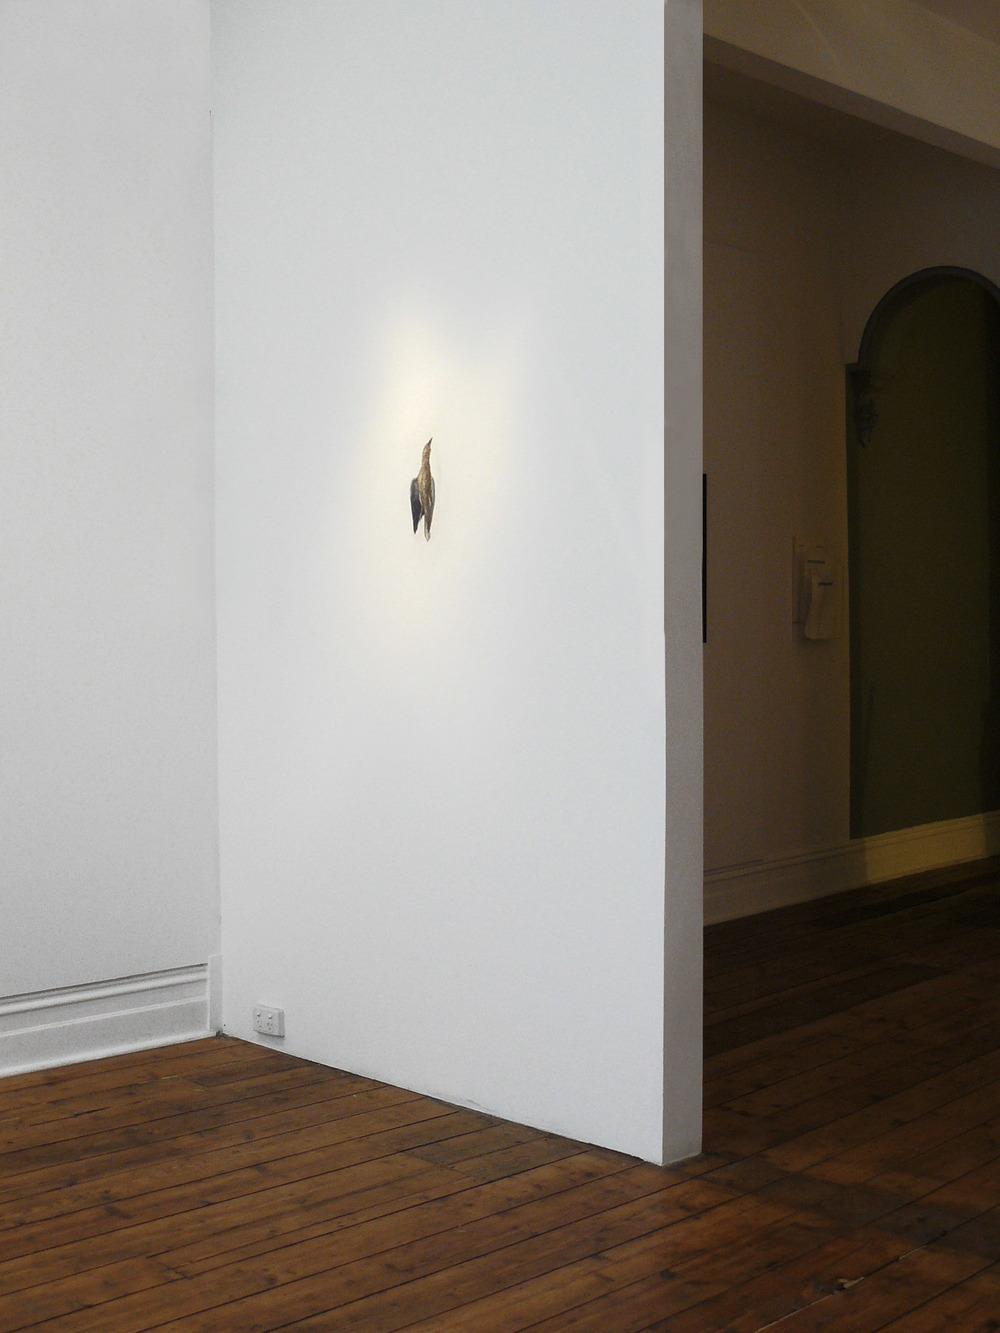 Stephen Garrett, Dead Bird 2010